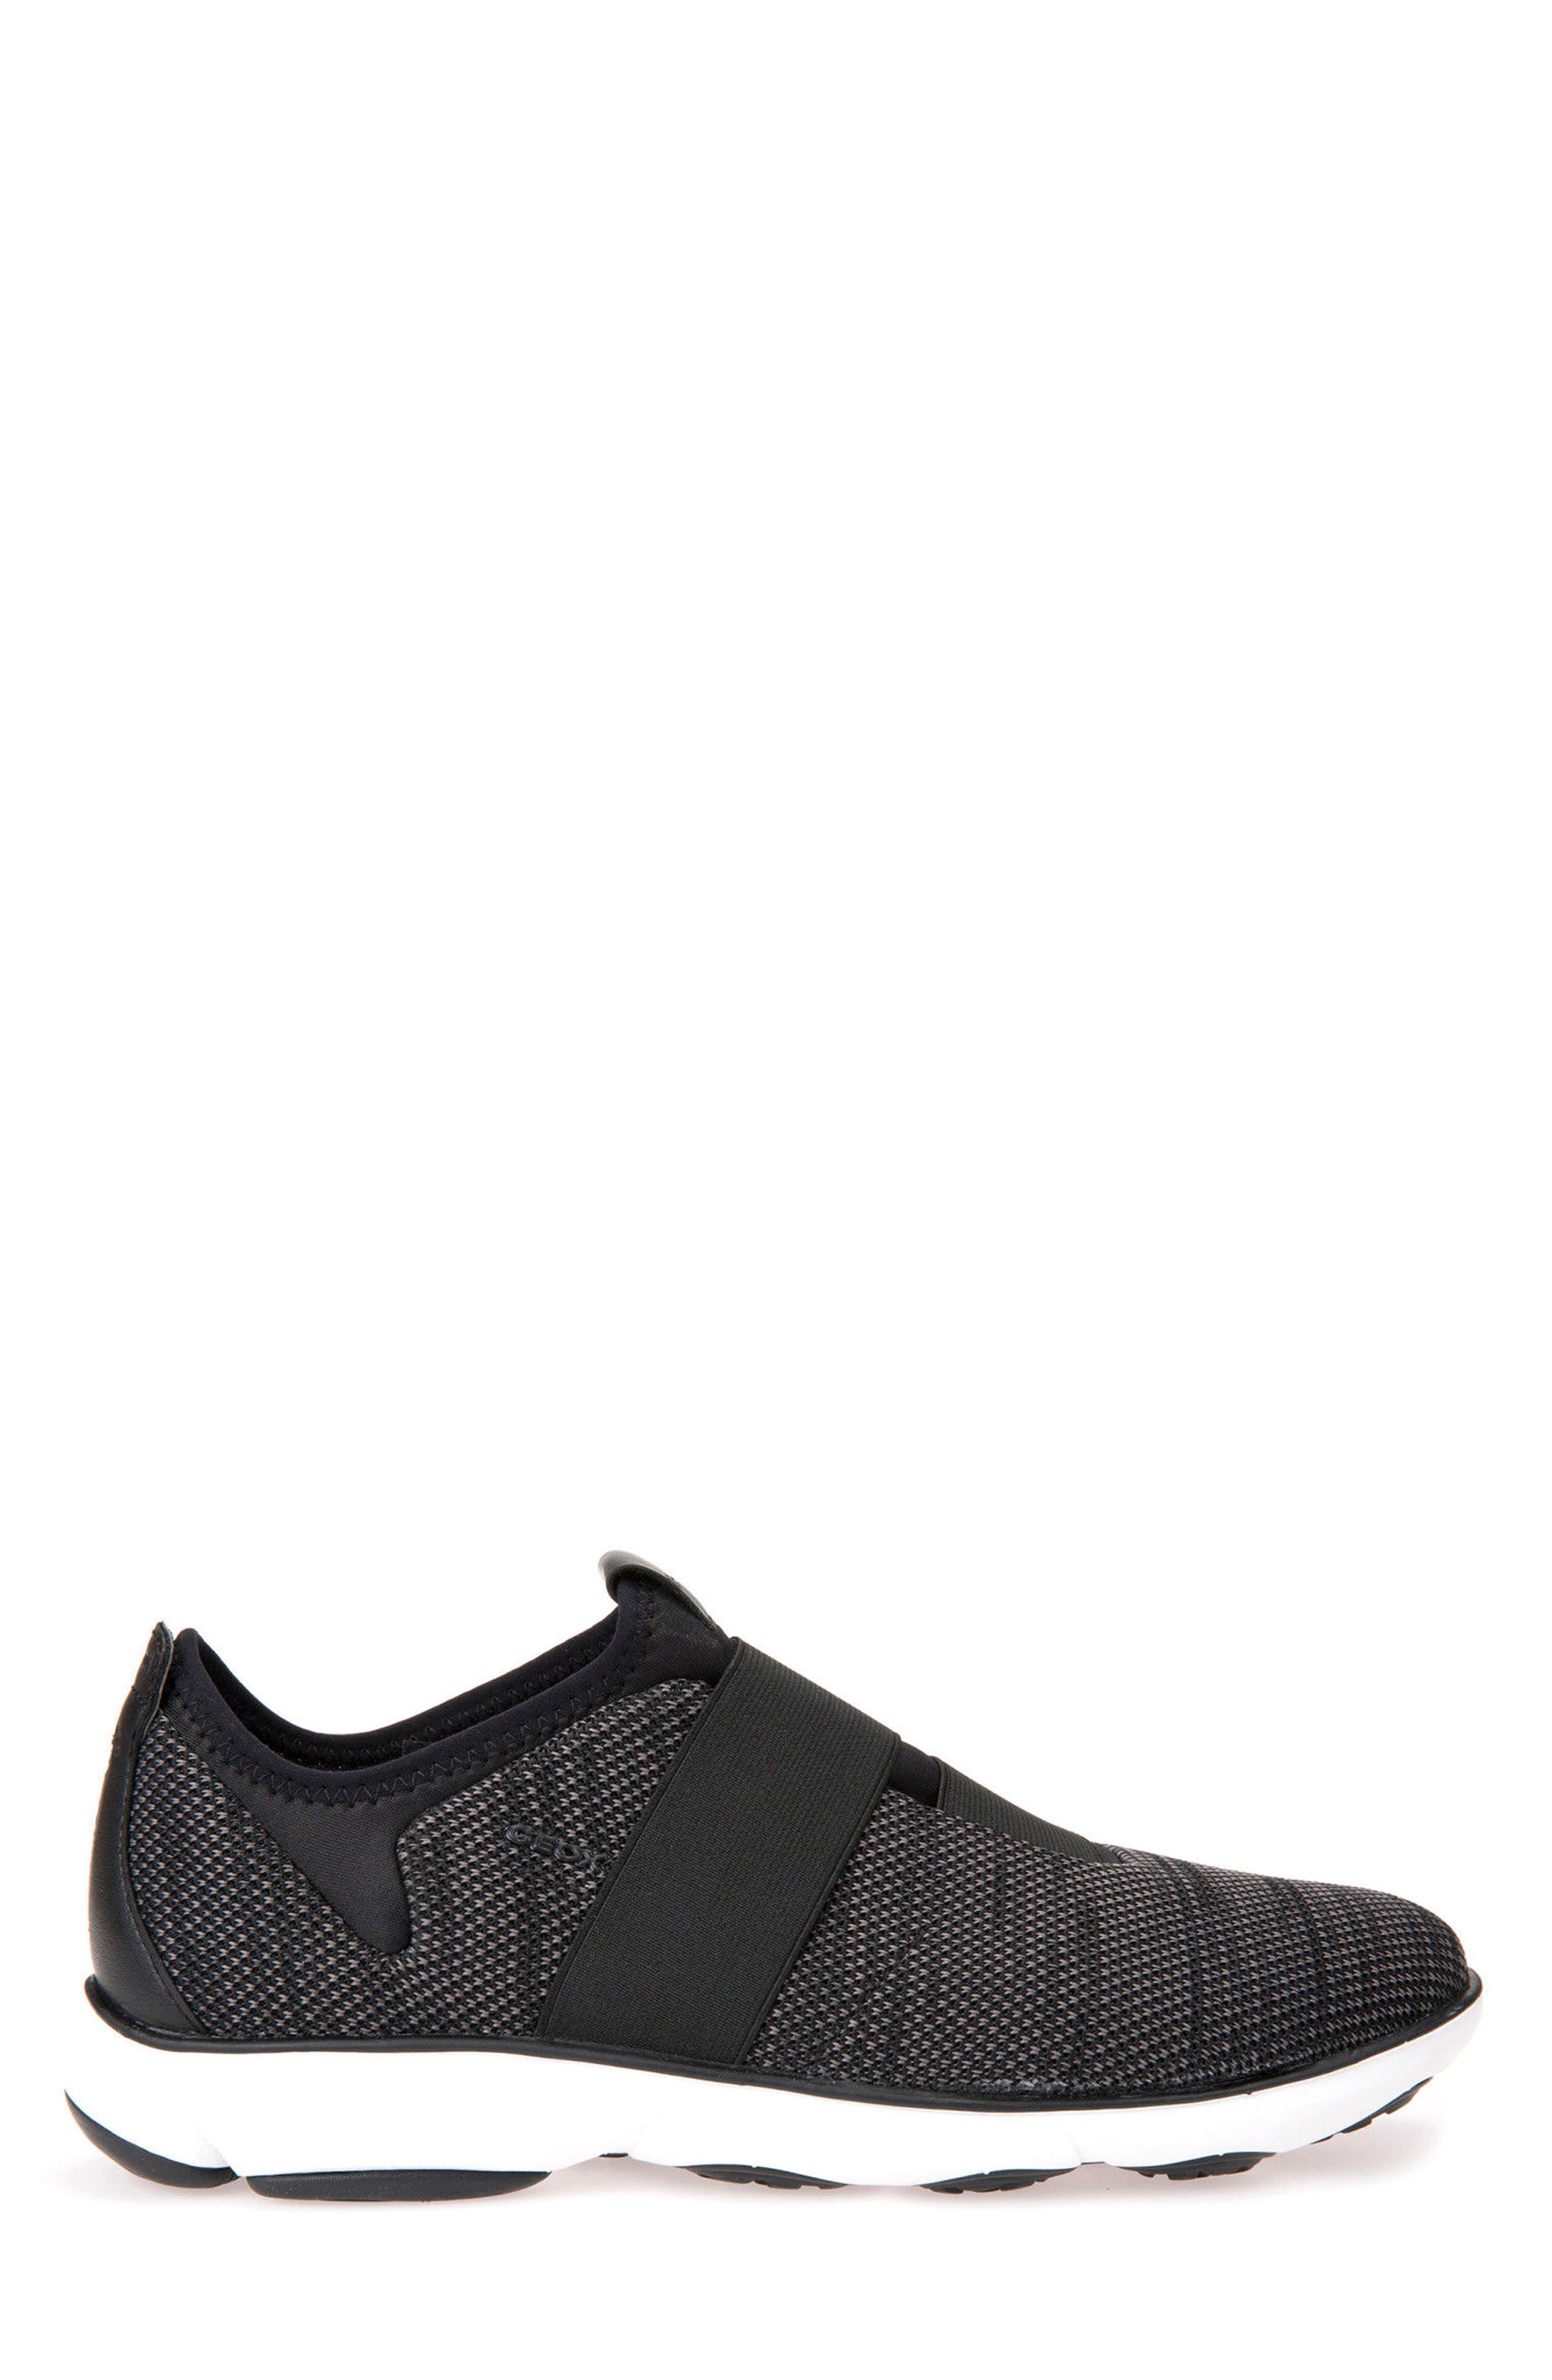 Nebula 45 Banded Slip-On Sneaker,                             Main thumbnail 1, color,                             BLACK